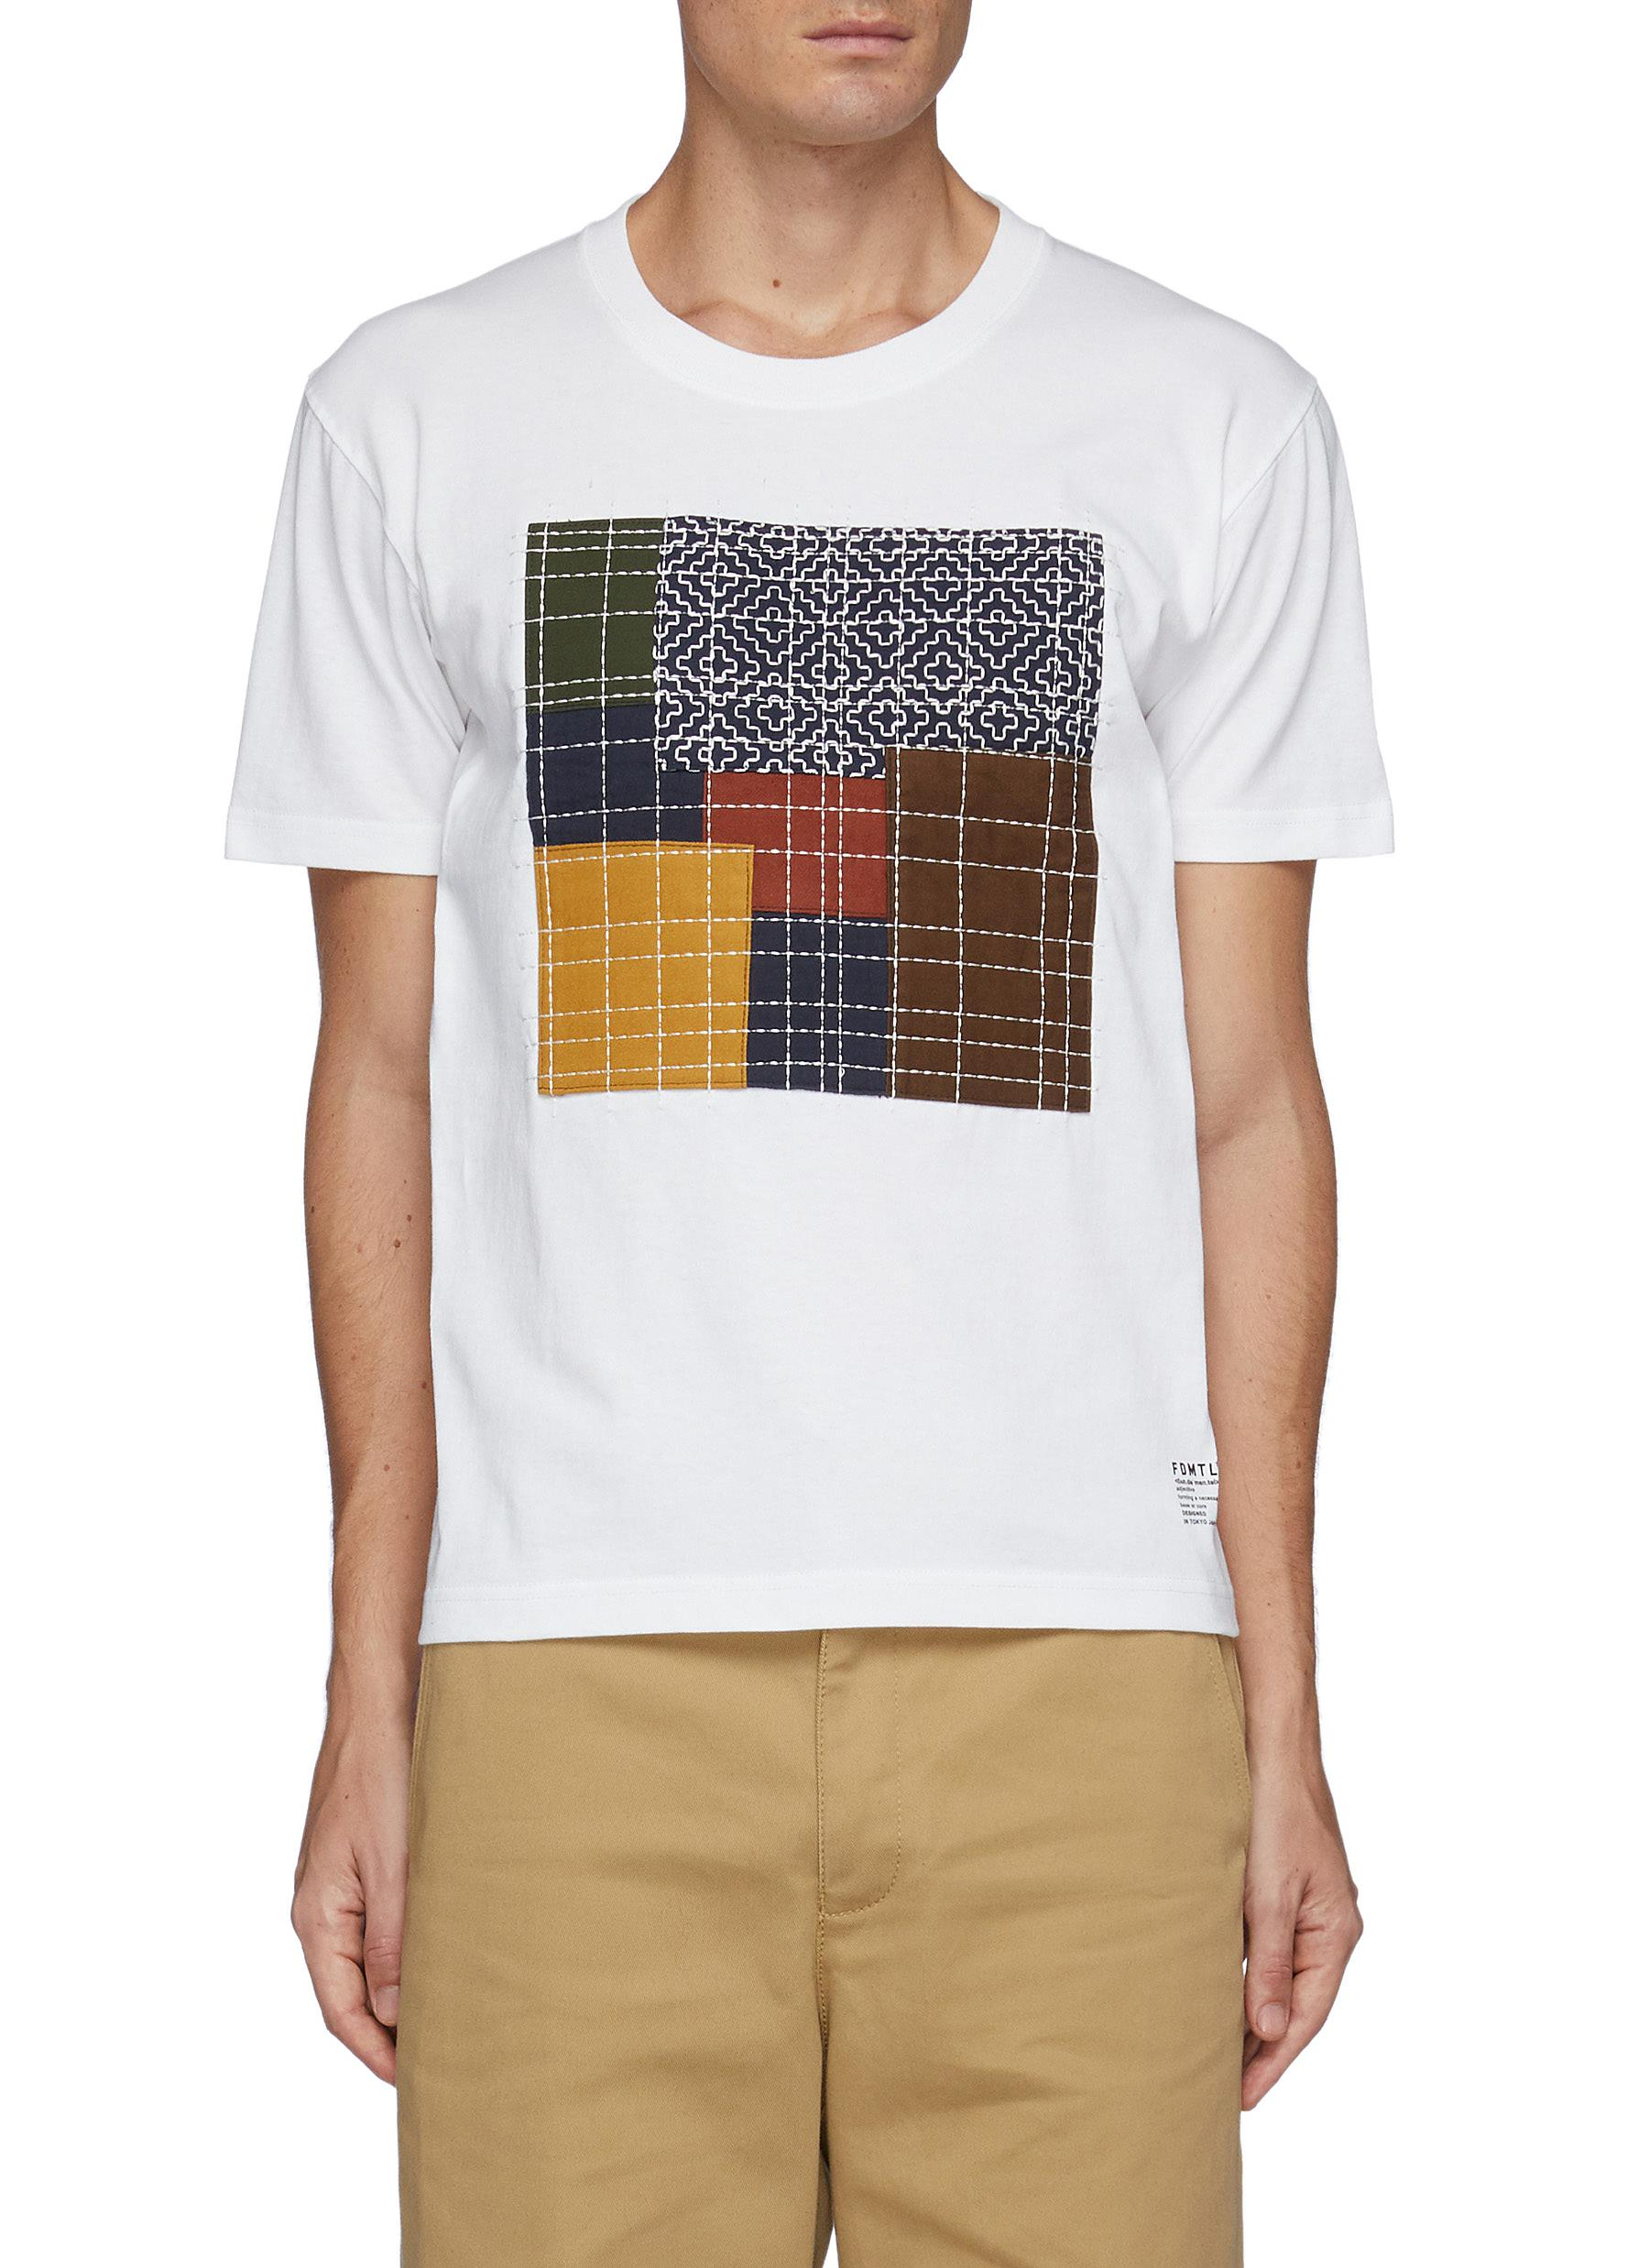 Boro Patchwork T-Shirt